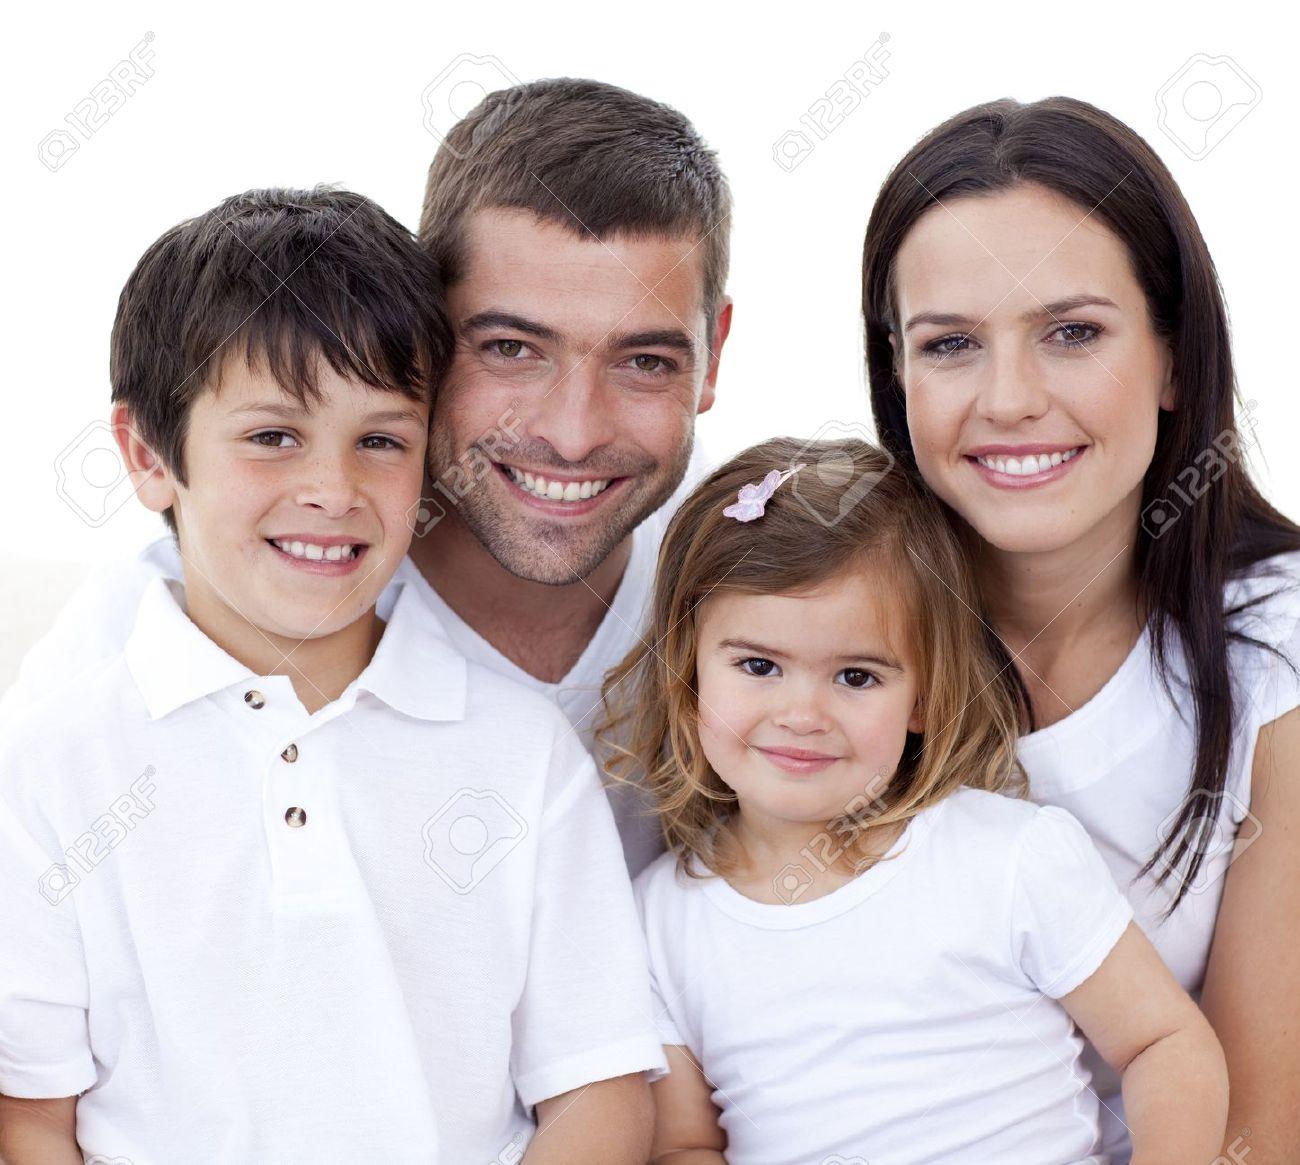 10250137-Portrait-of-happy-family-smiling-Stock-Photo-free